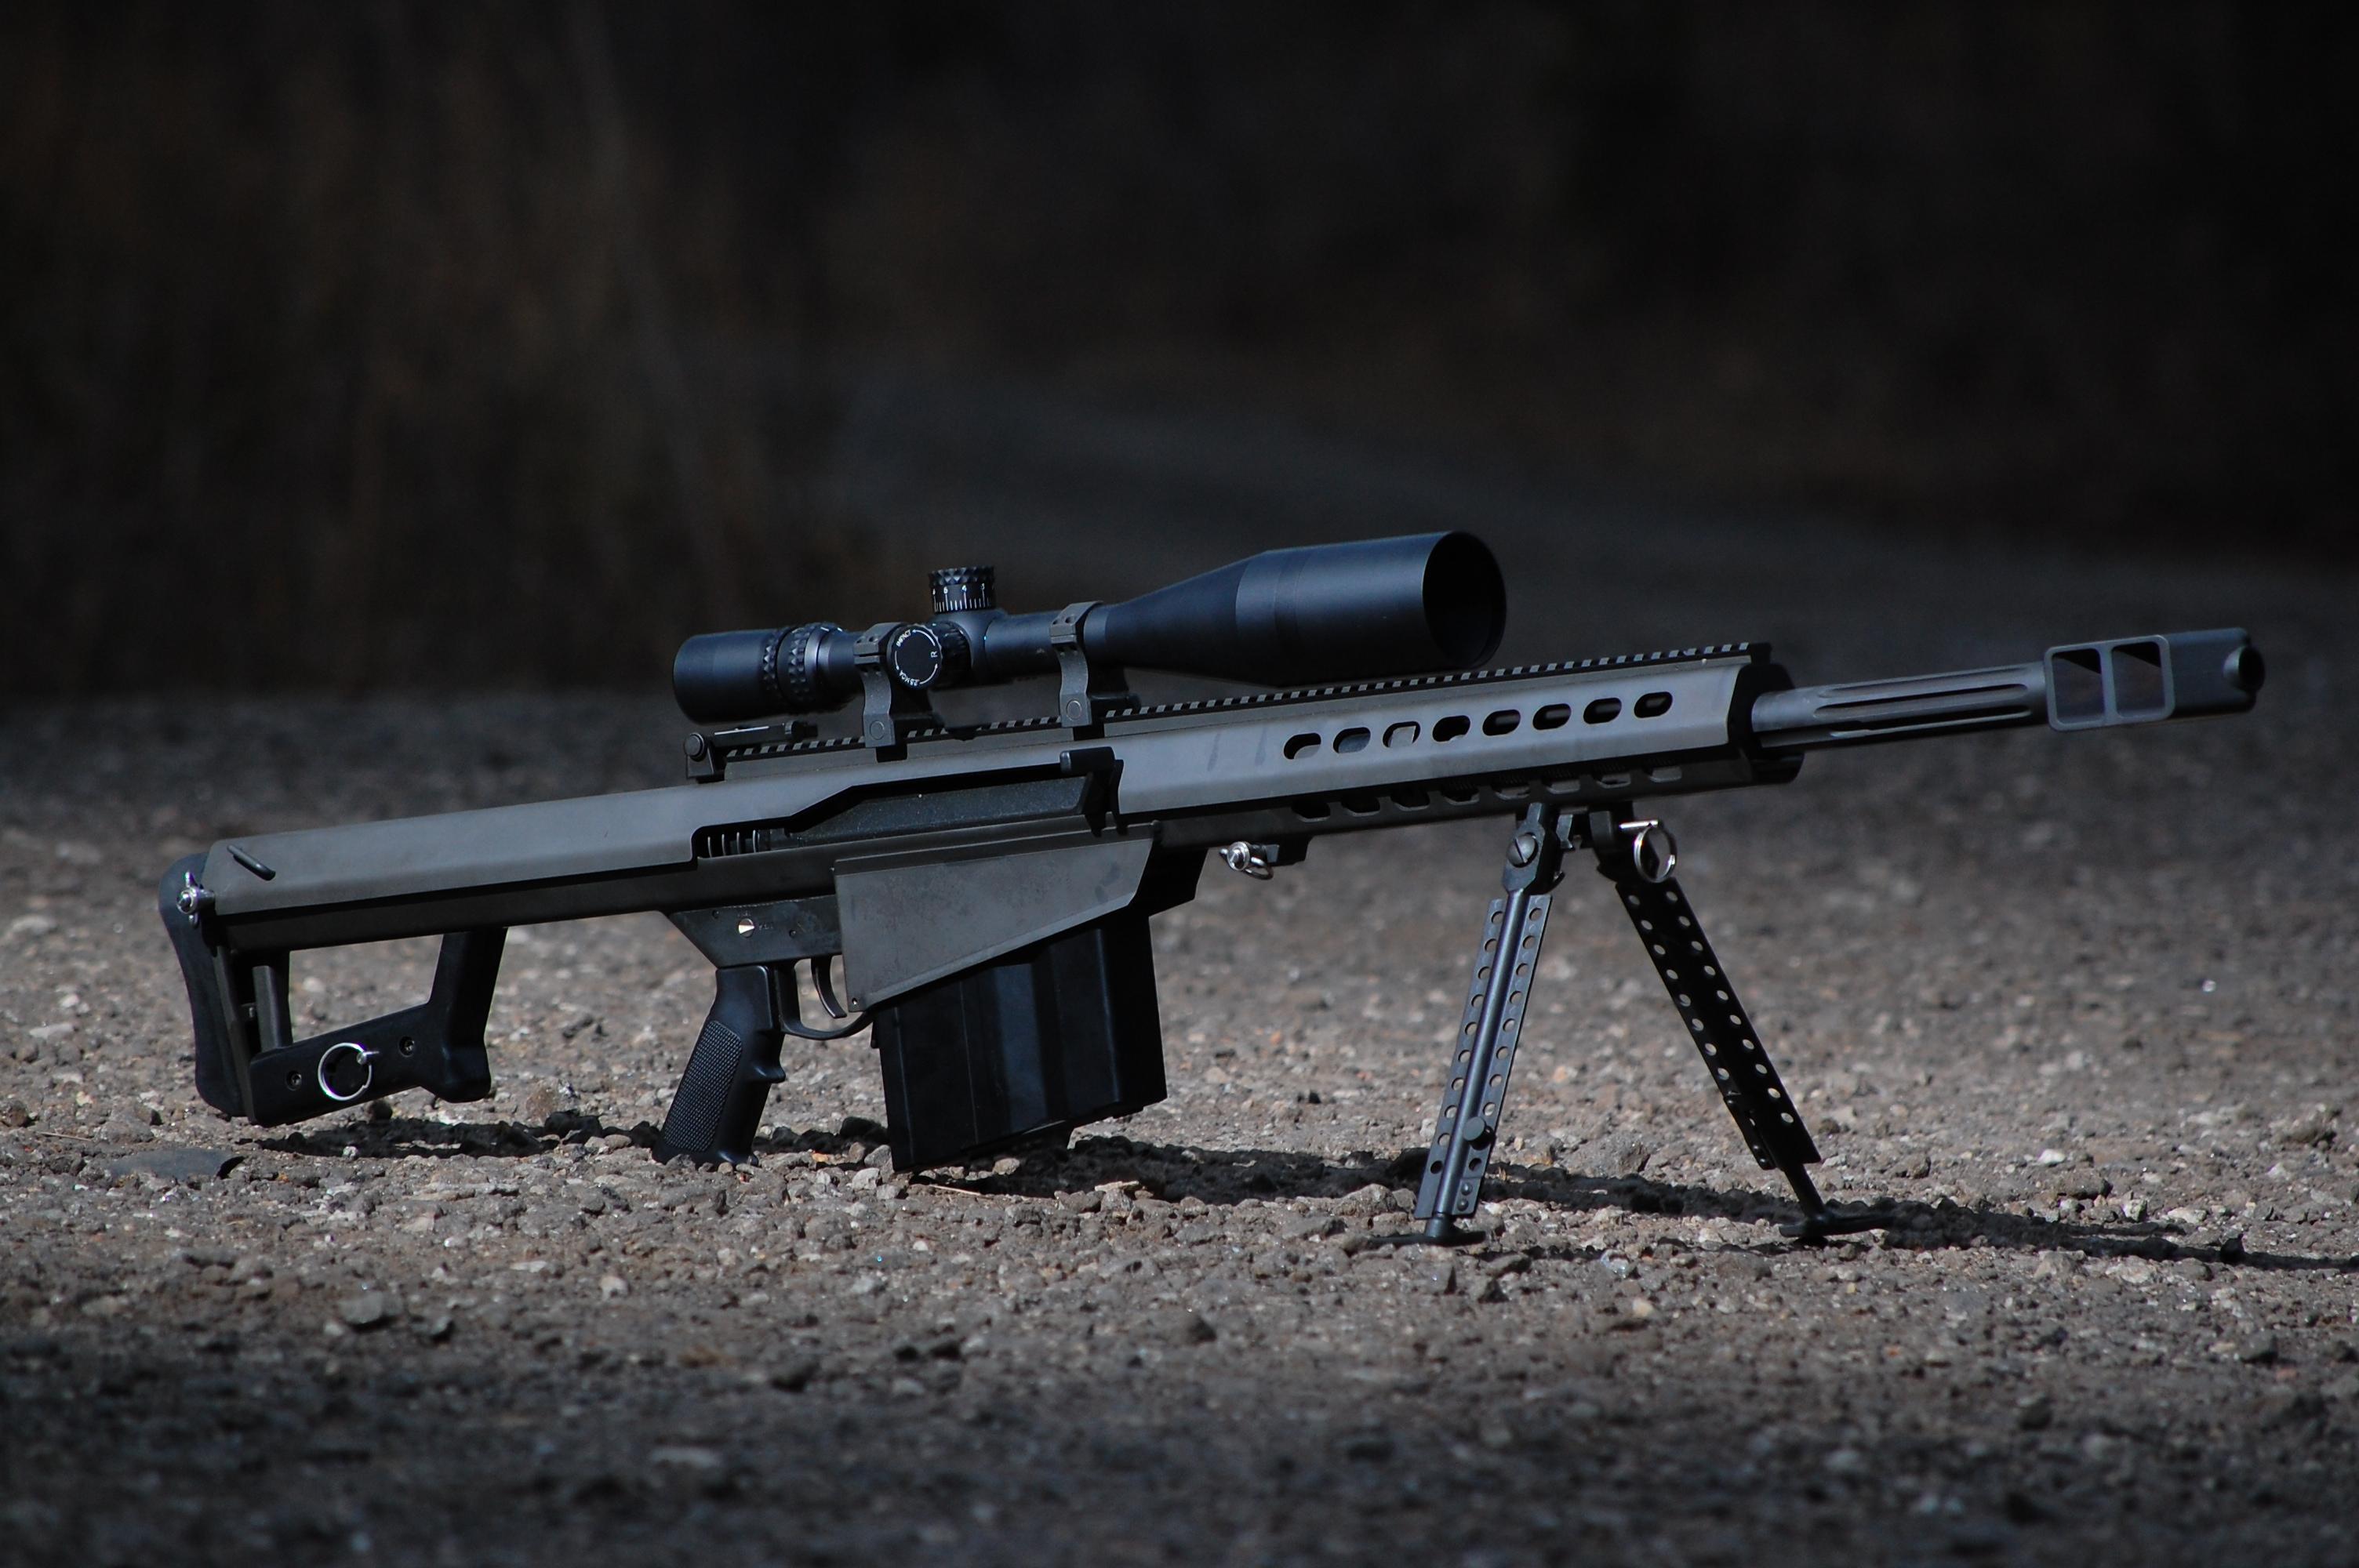 Sniper Rifle HD Wallpaper Background Image 3008x2000 ID 3008x2000